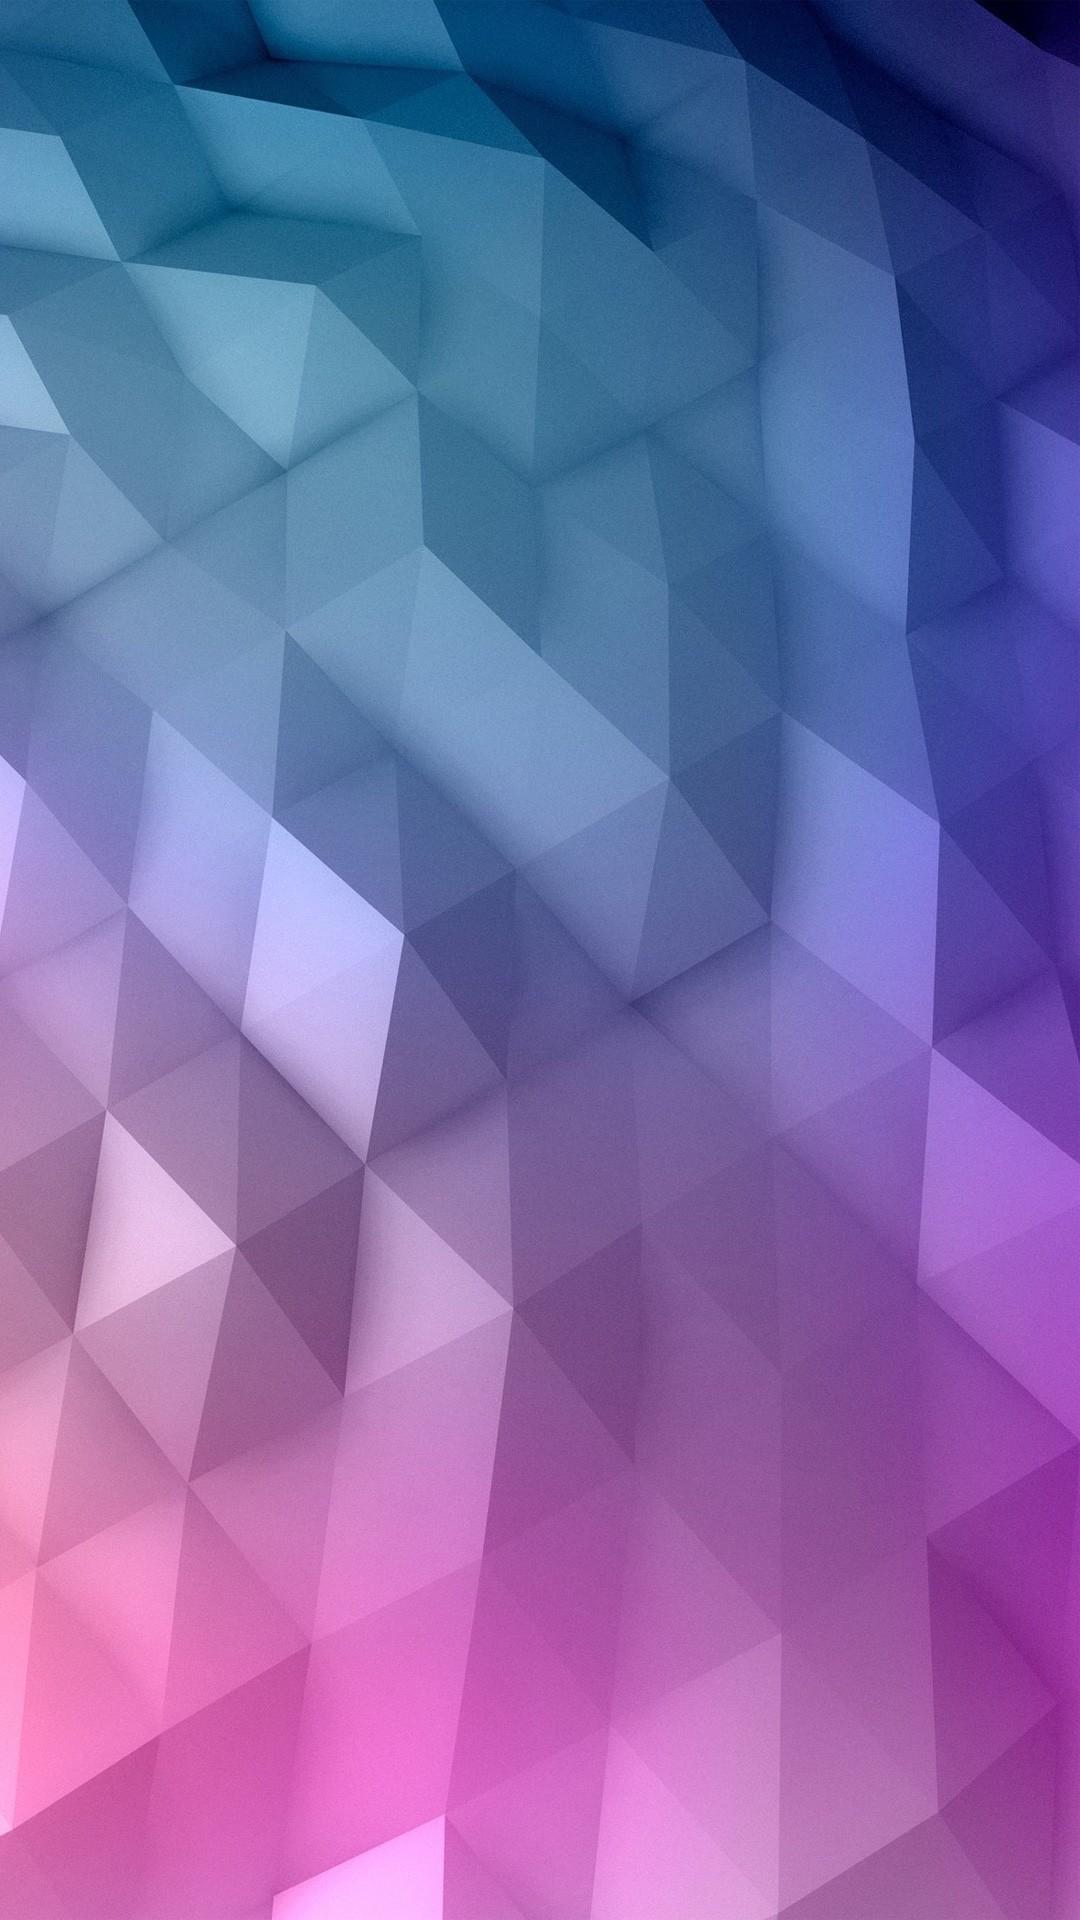 Gradient Geometry Wallpaper iPhone 6 Plus preview 1080x1920